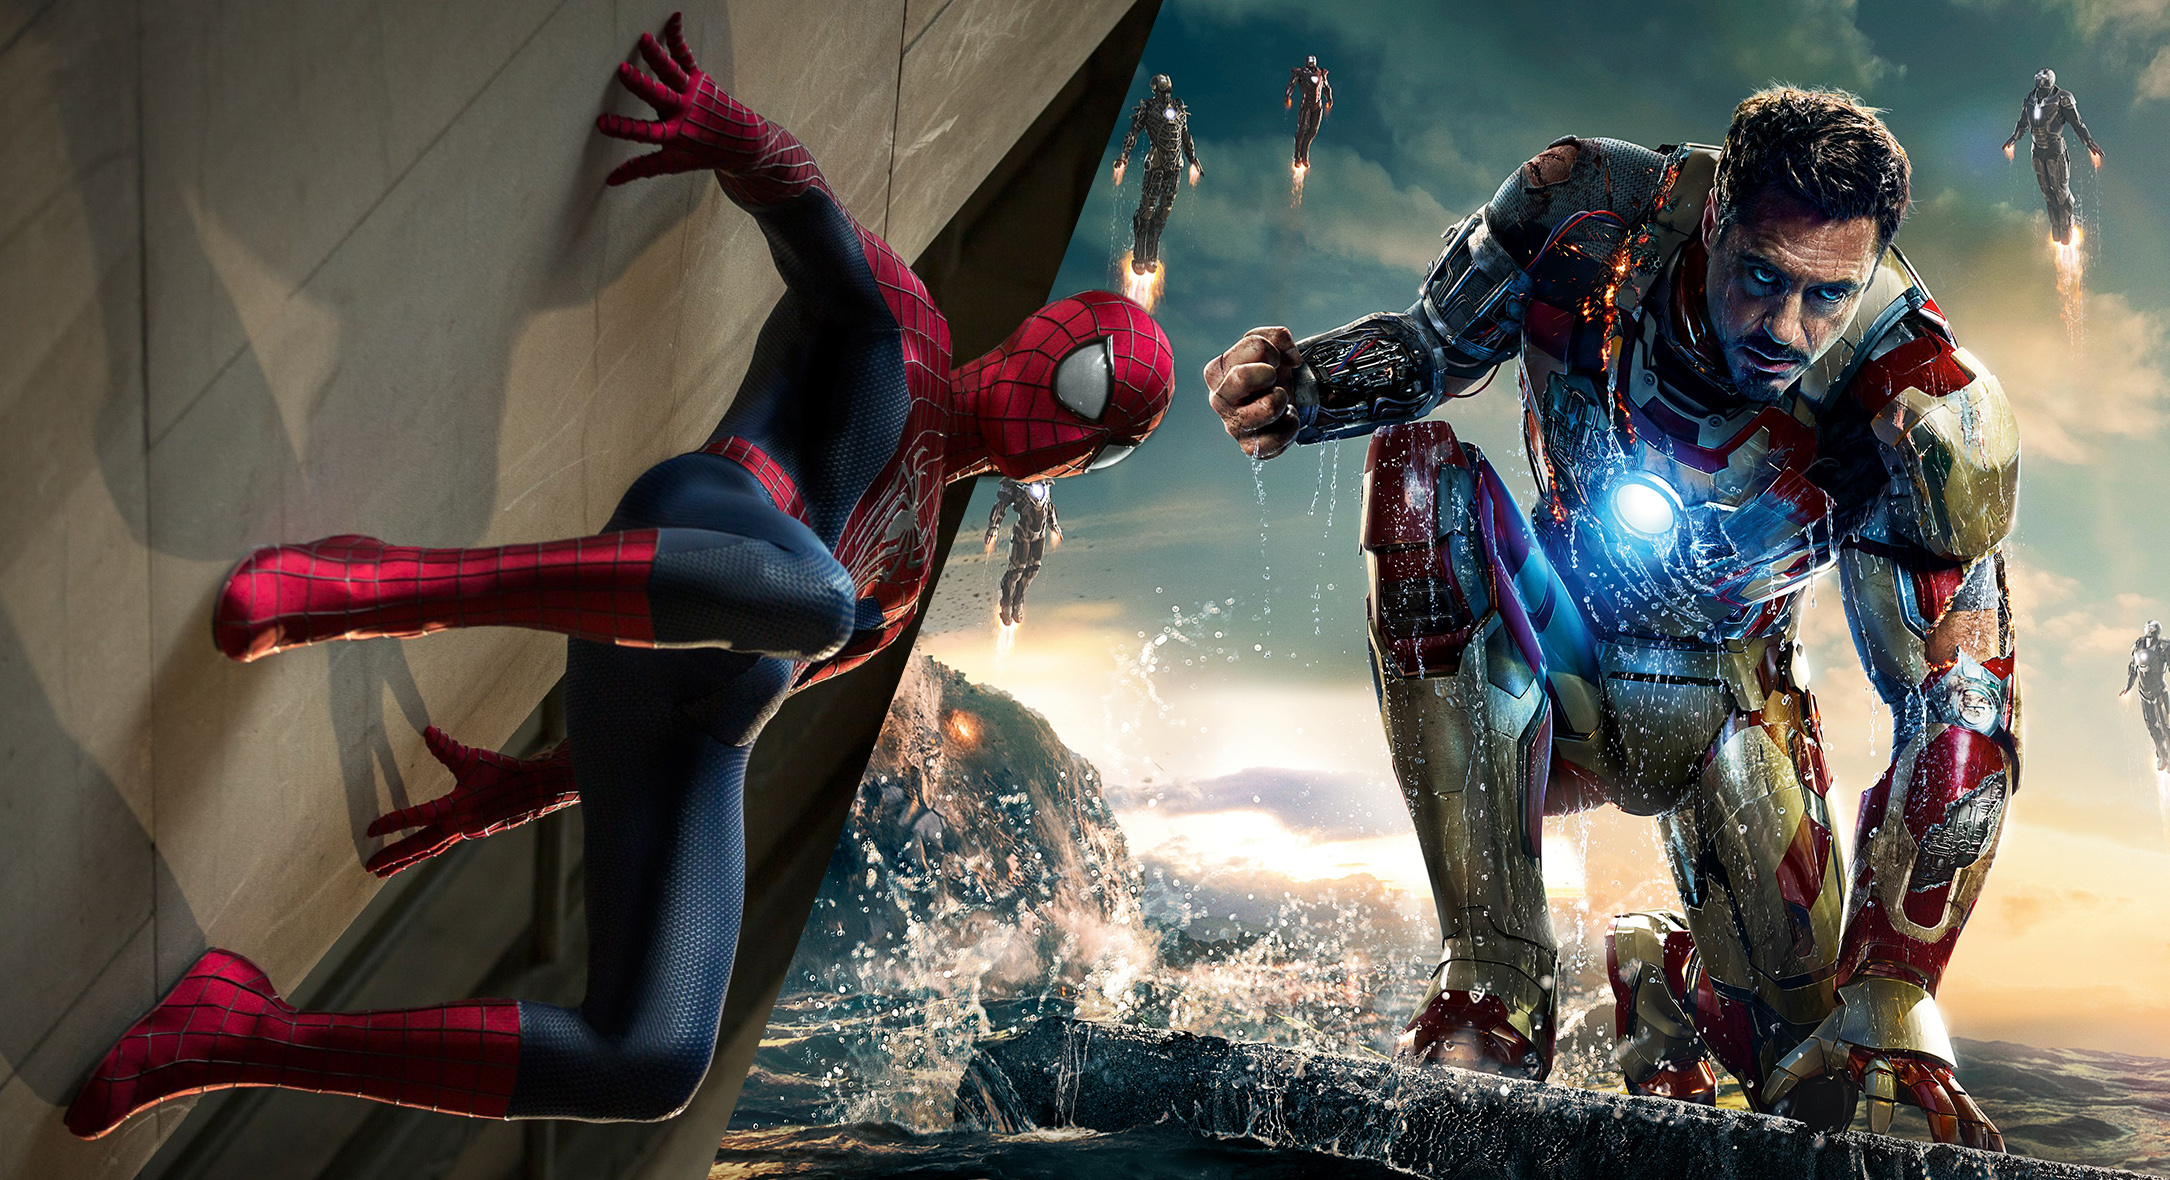 Yep Iron Man will be in the new Spider Man film